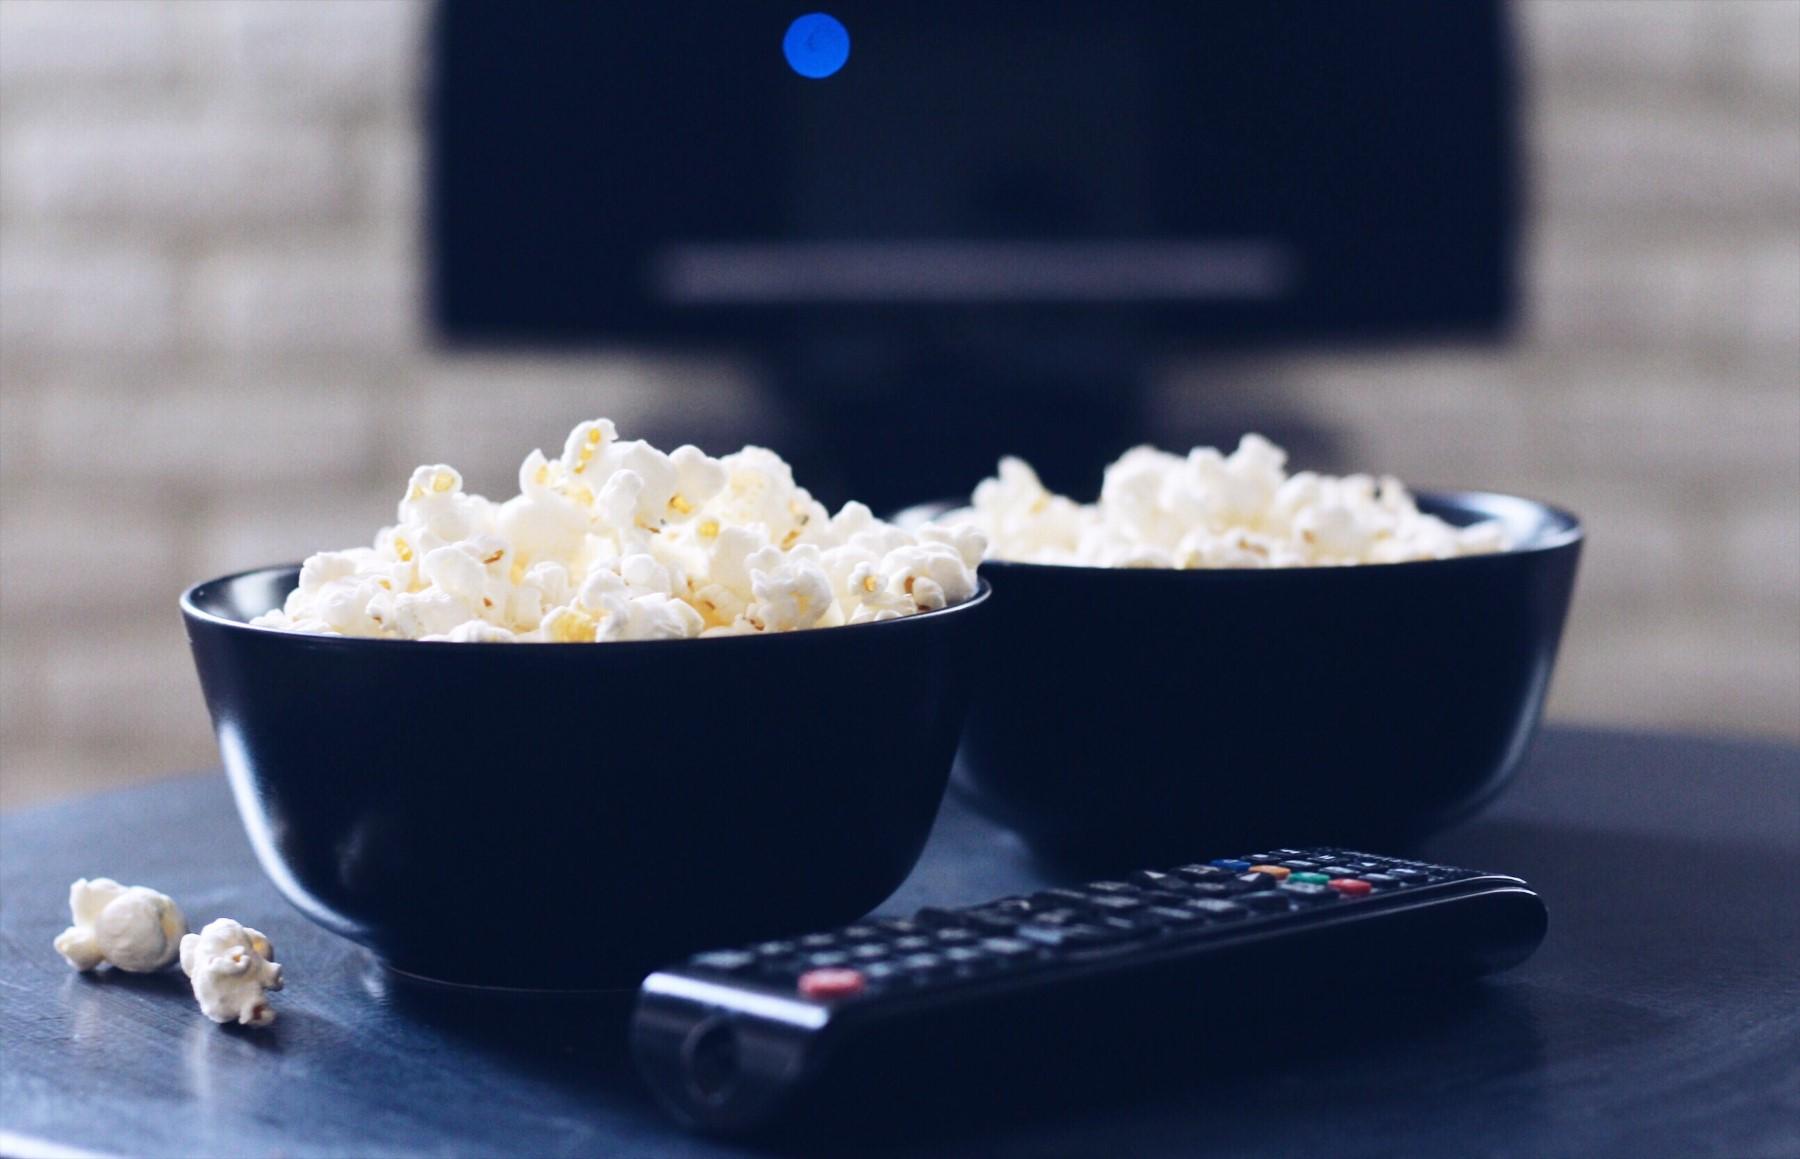 dodatkowe funkcje telewizora